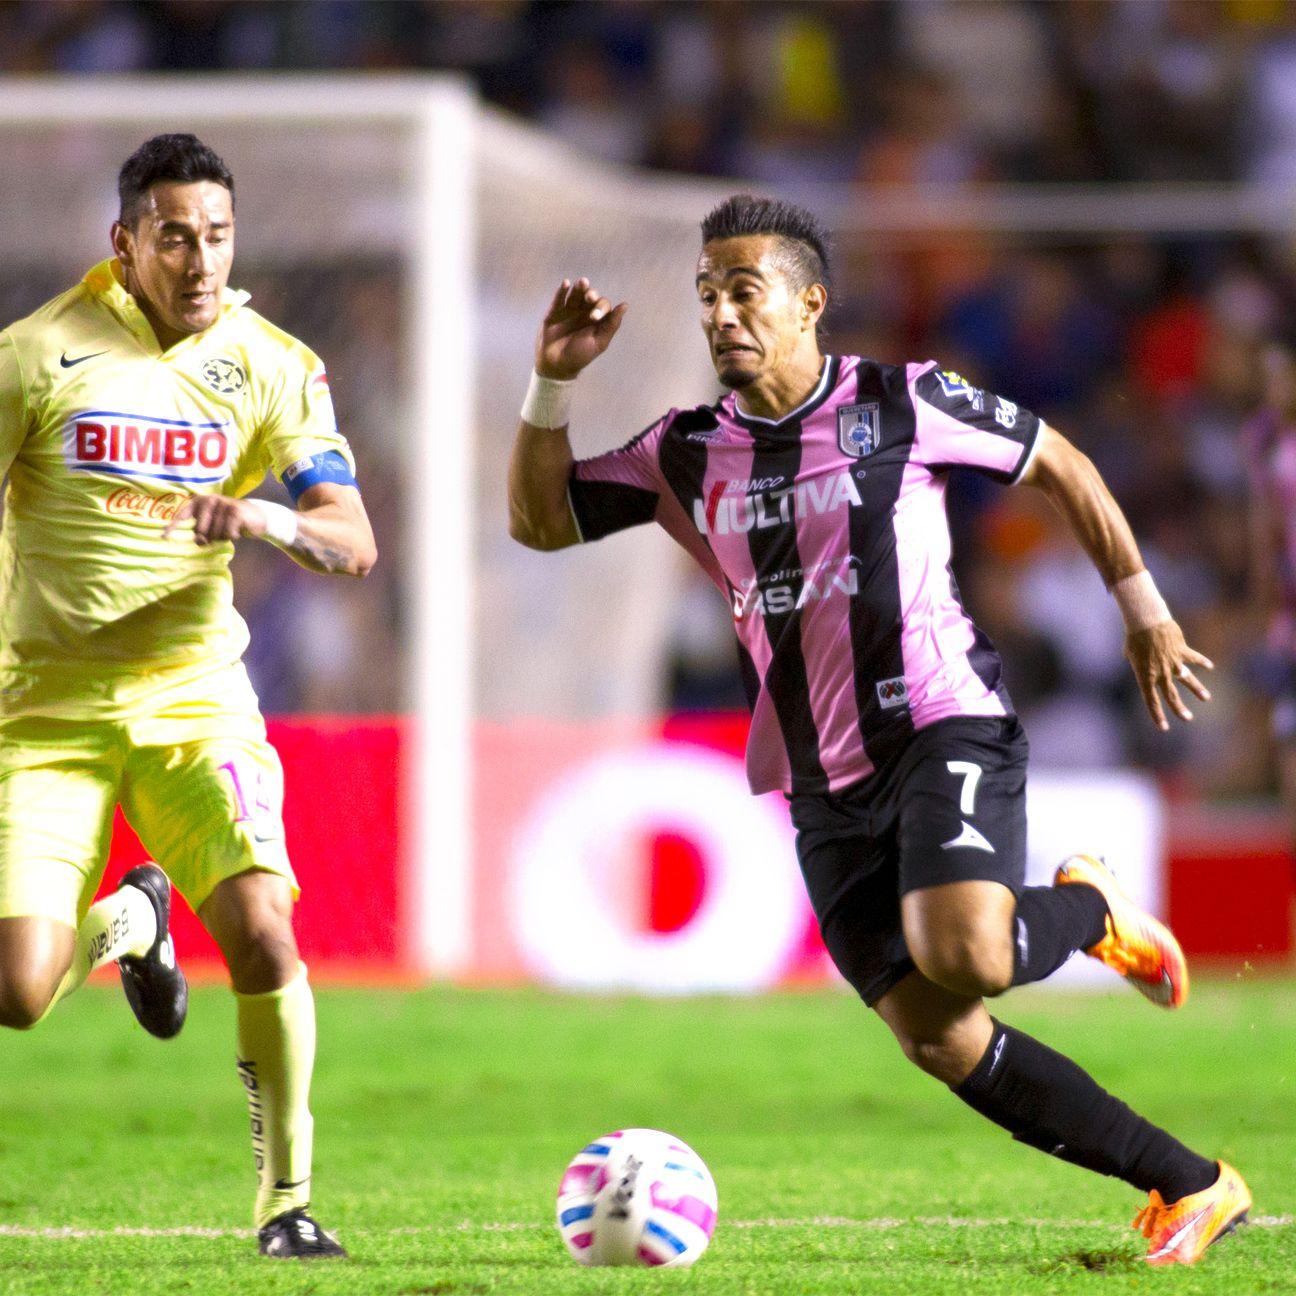 Former Vancouver Whitecap Camilo Sanvezzo scored in second-half stoppage time to help Queretaro upset Liga MX leaders Club America.